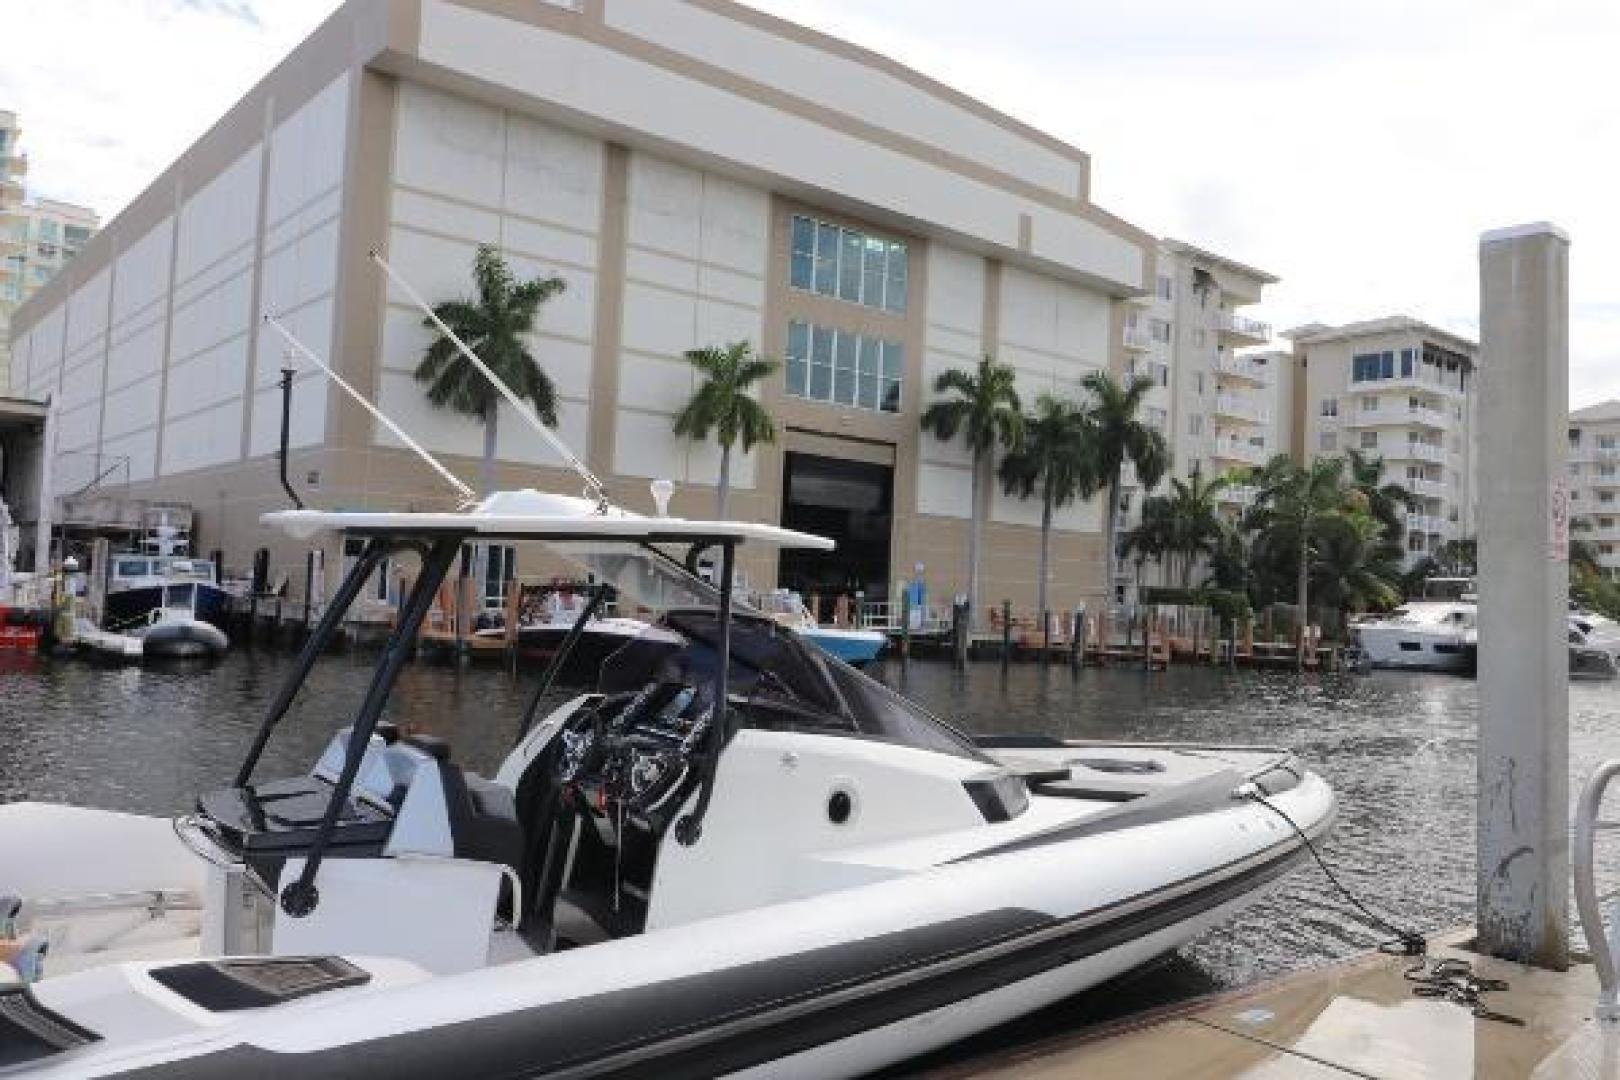 Sacs-Strider 40 ESSE R 2016-Sacs Strider 40 ESSE R Fort Lauderdale-Florida-United States-1533425   Thumbnail